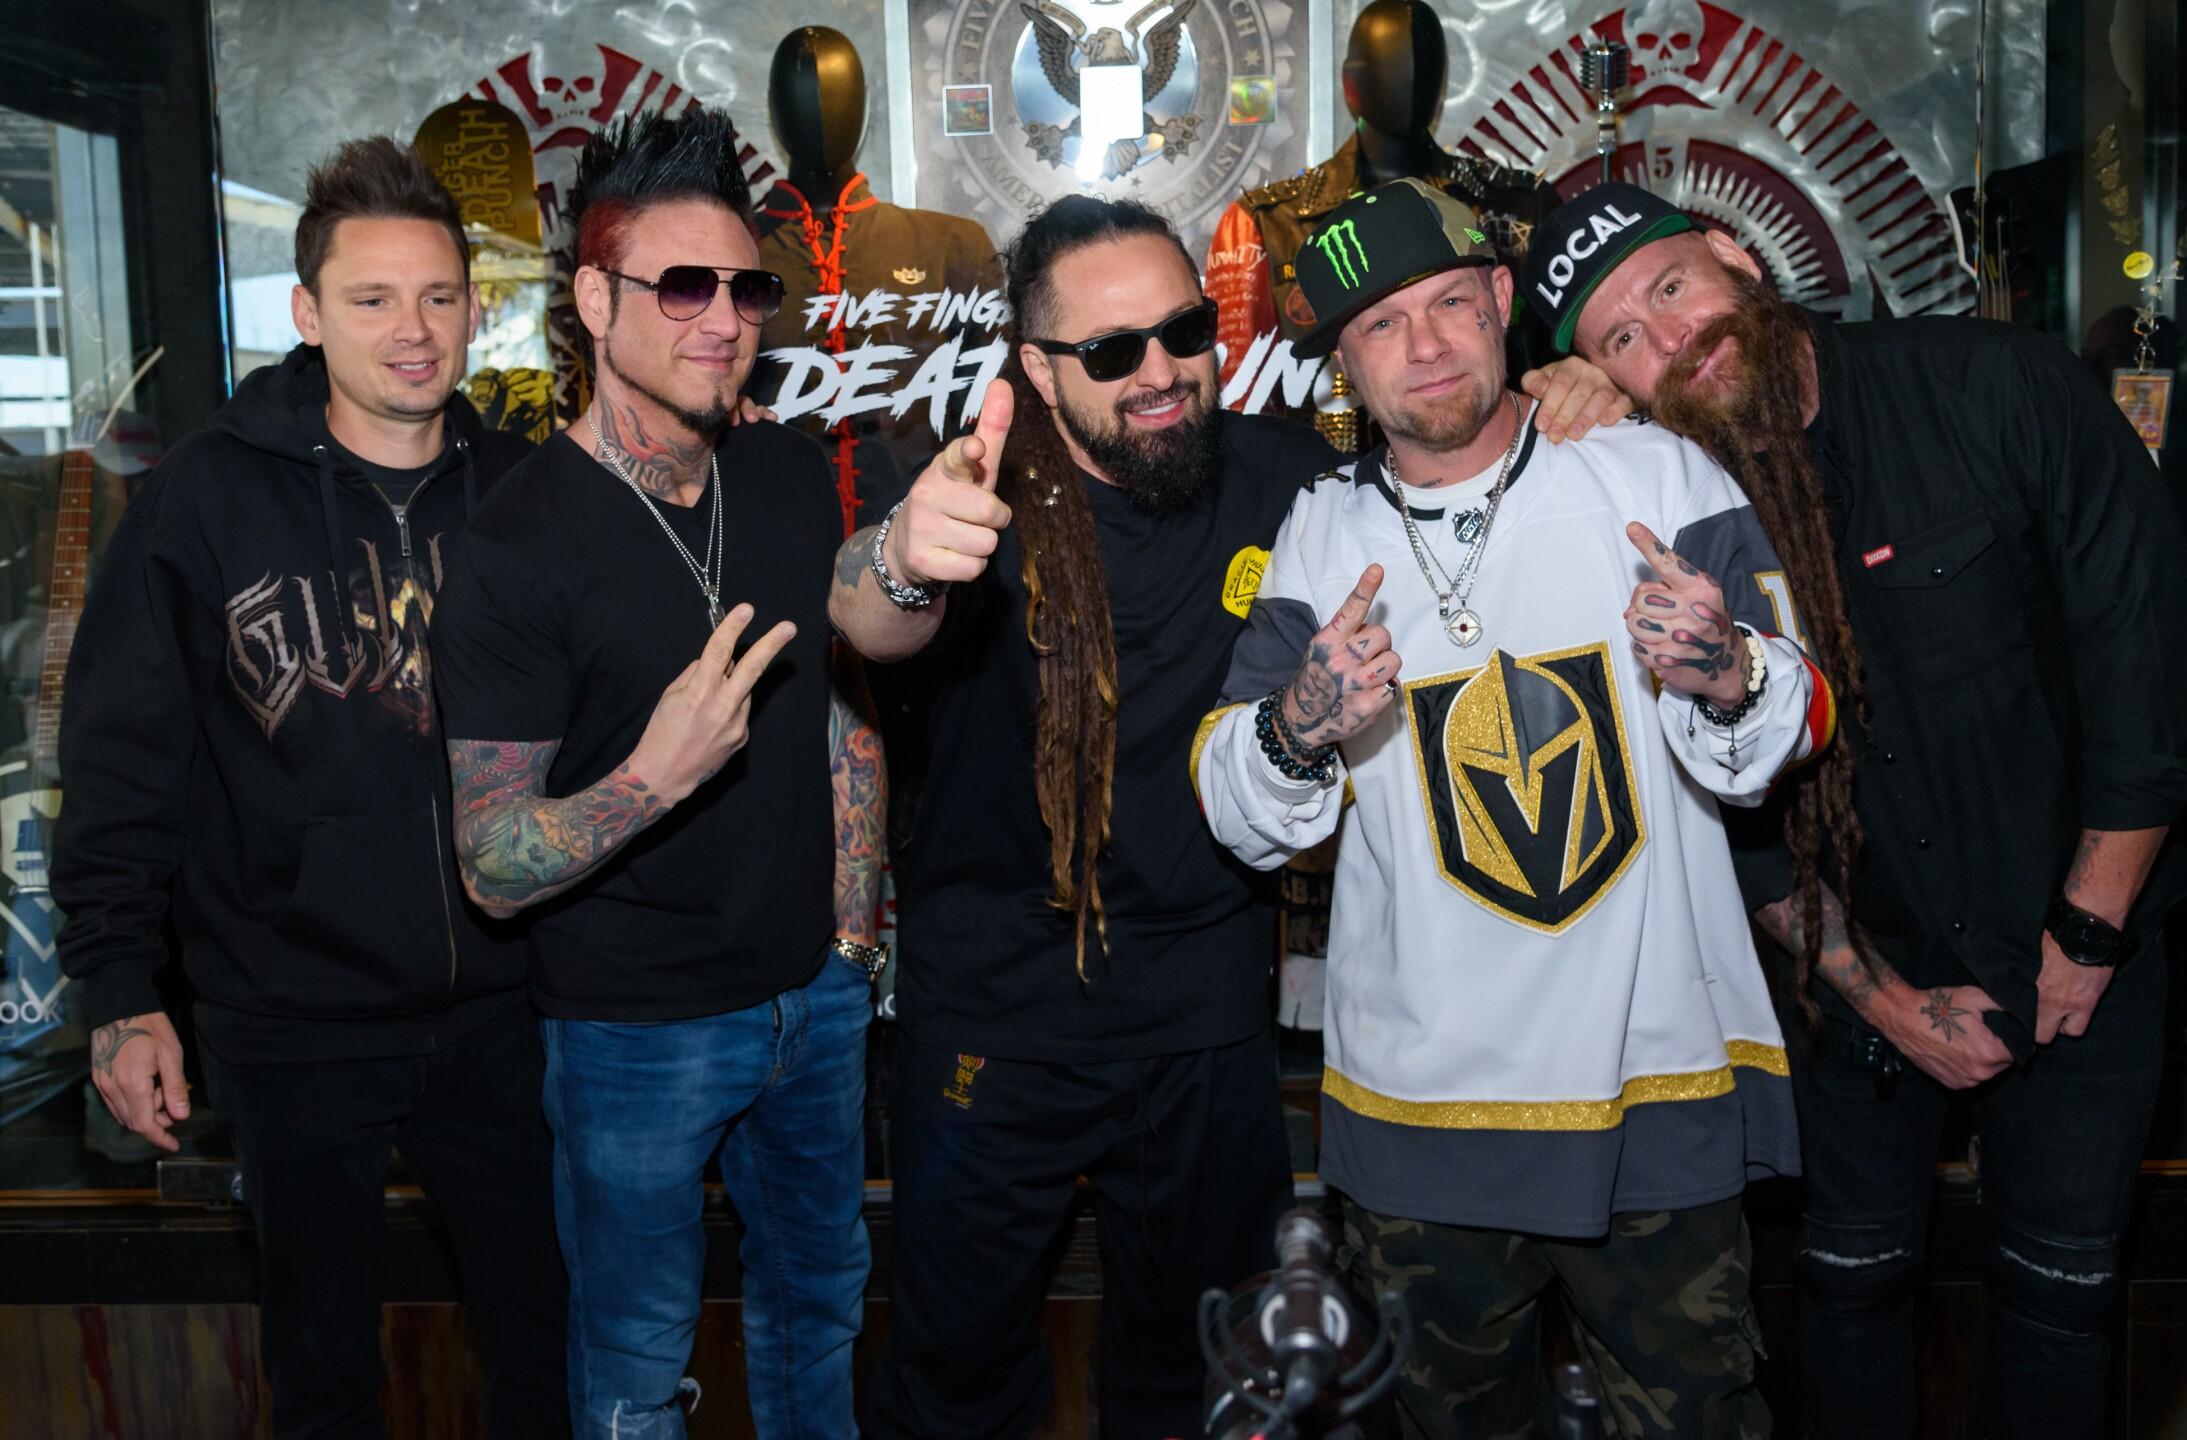 11_01_19_HRH_Five Finger Death Punch Case Unveil_Gray_KPG_47.jpg